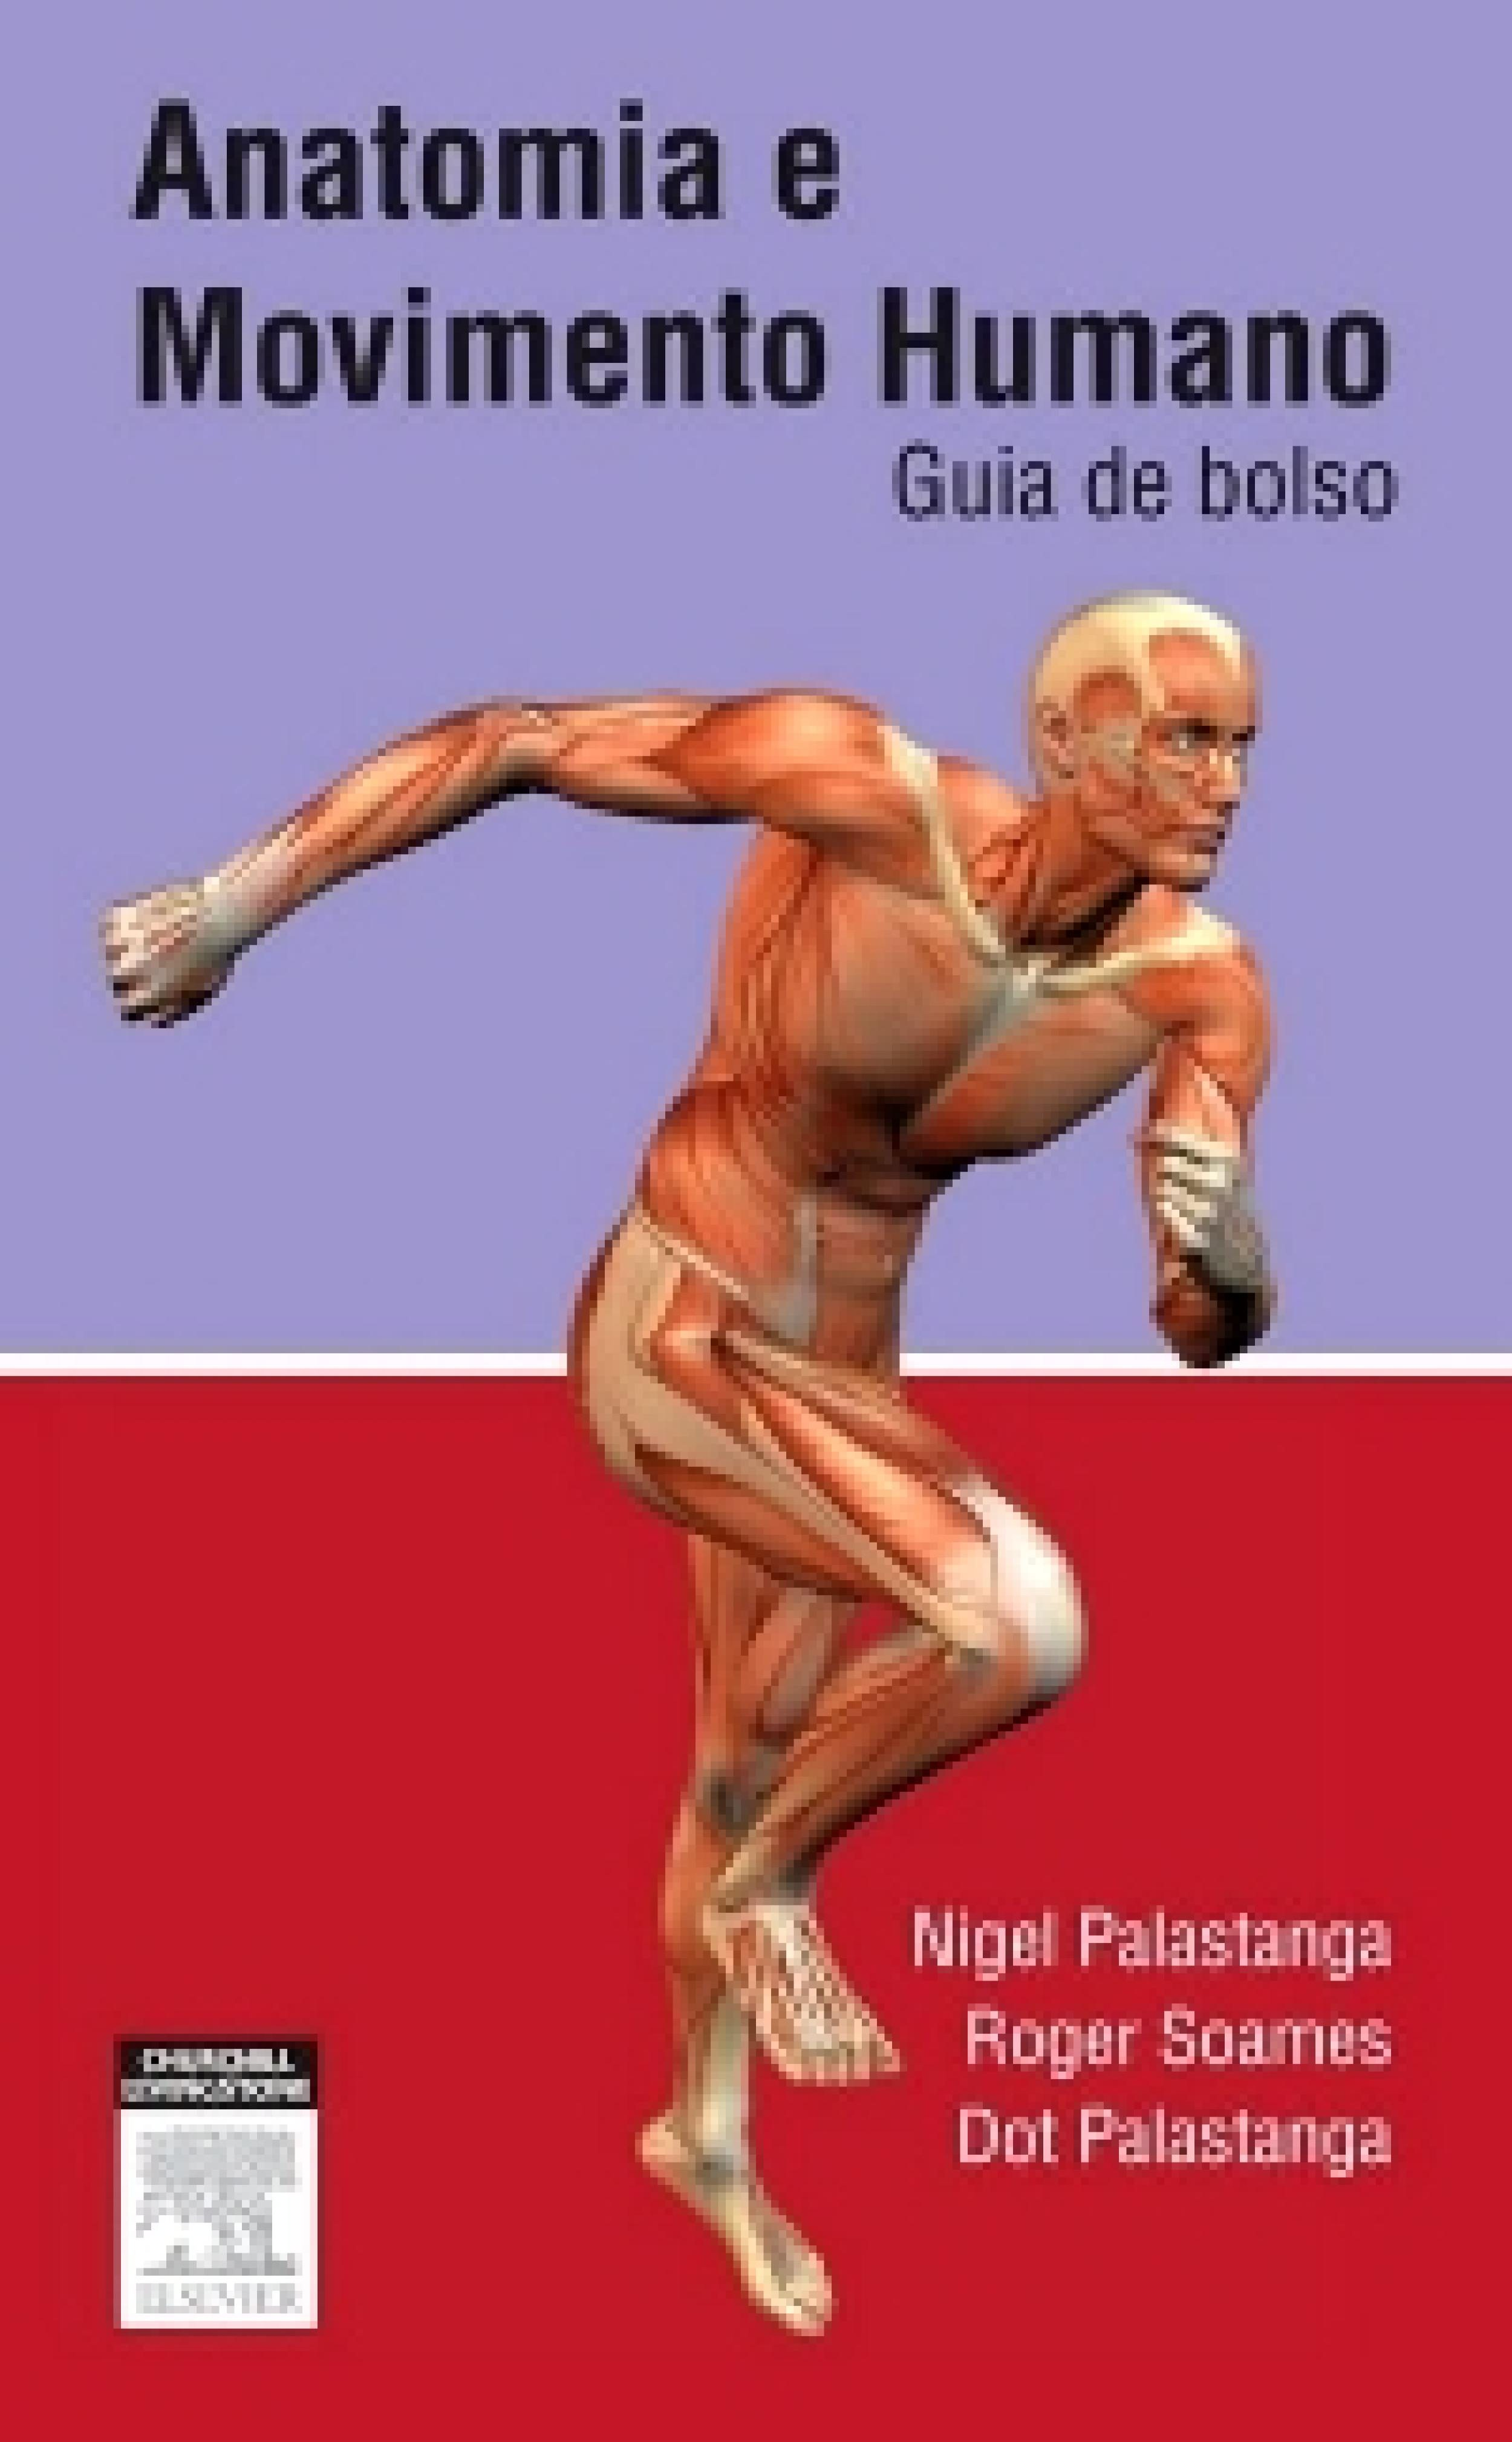 ANATOMIA DO MOVIMENTO HUMANO EBOOK | , NIGEL PALASTANGA | Descargar ...